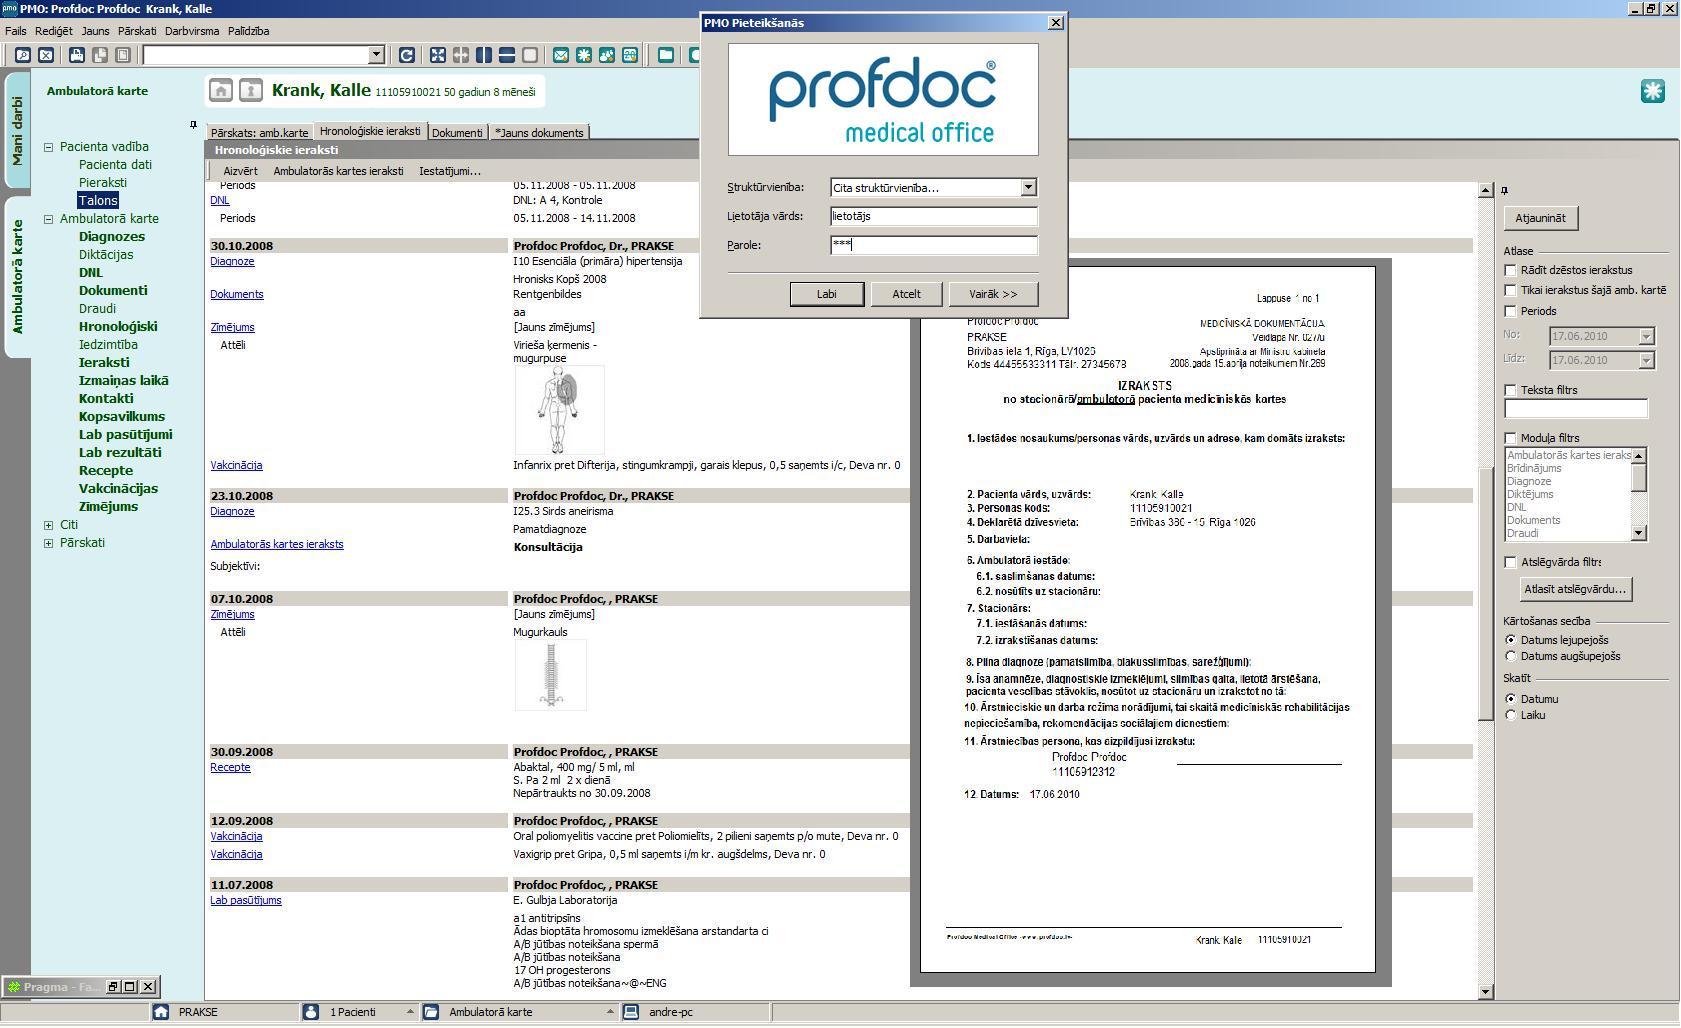 profdoc medical office